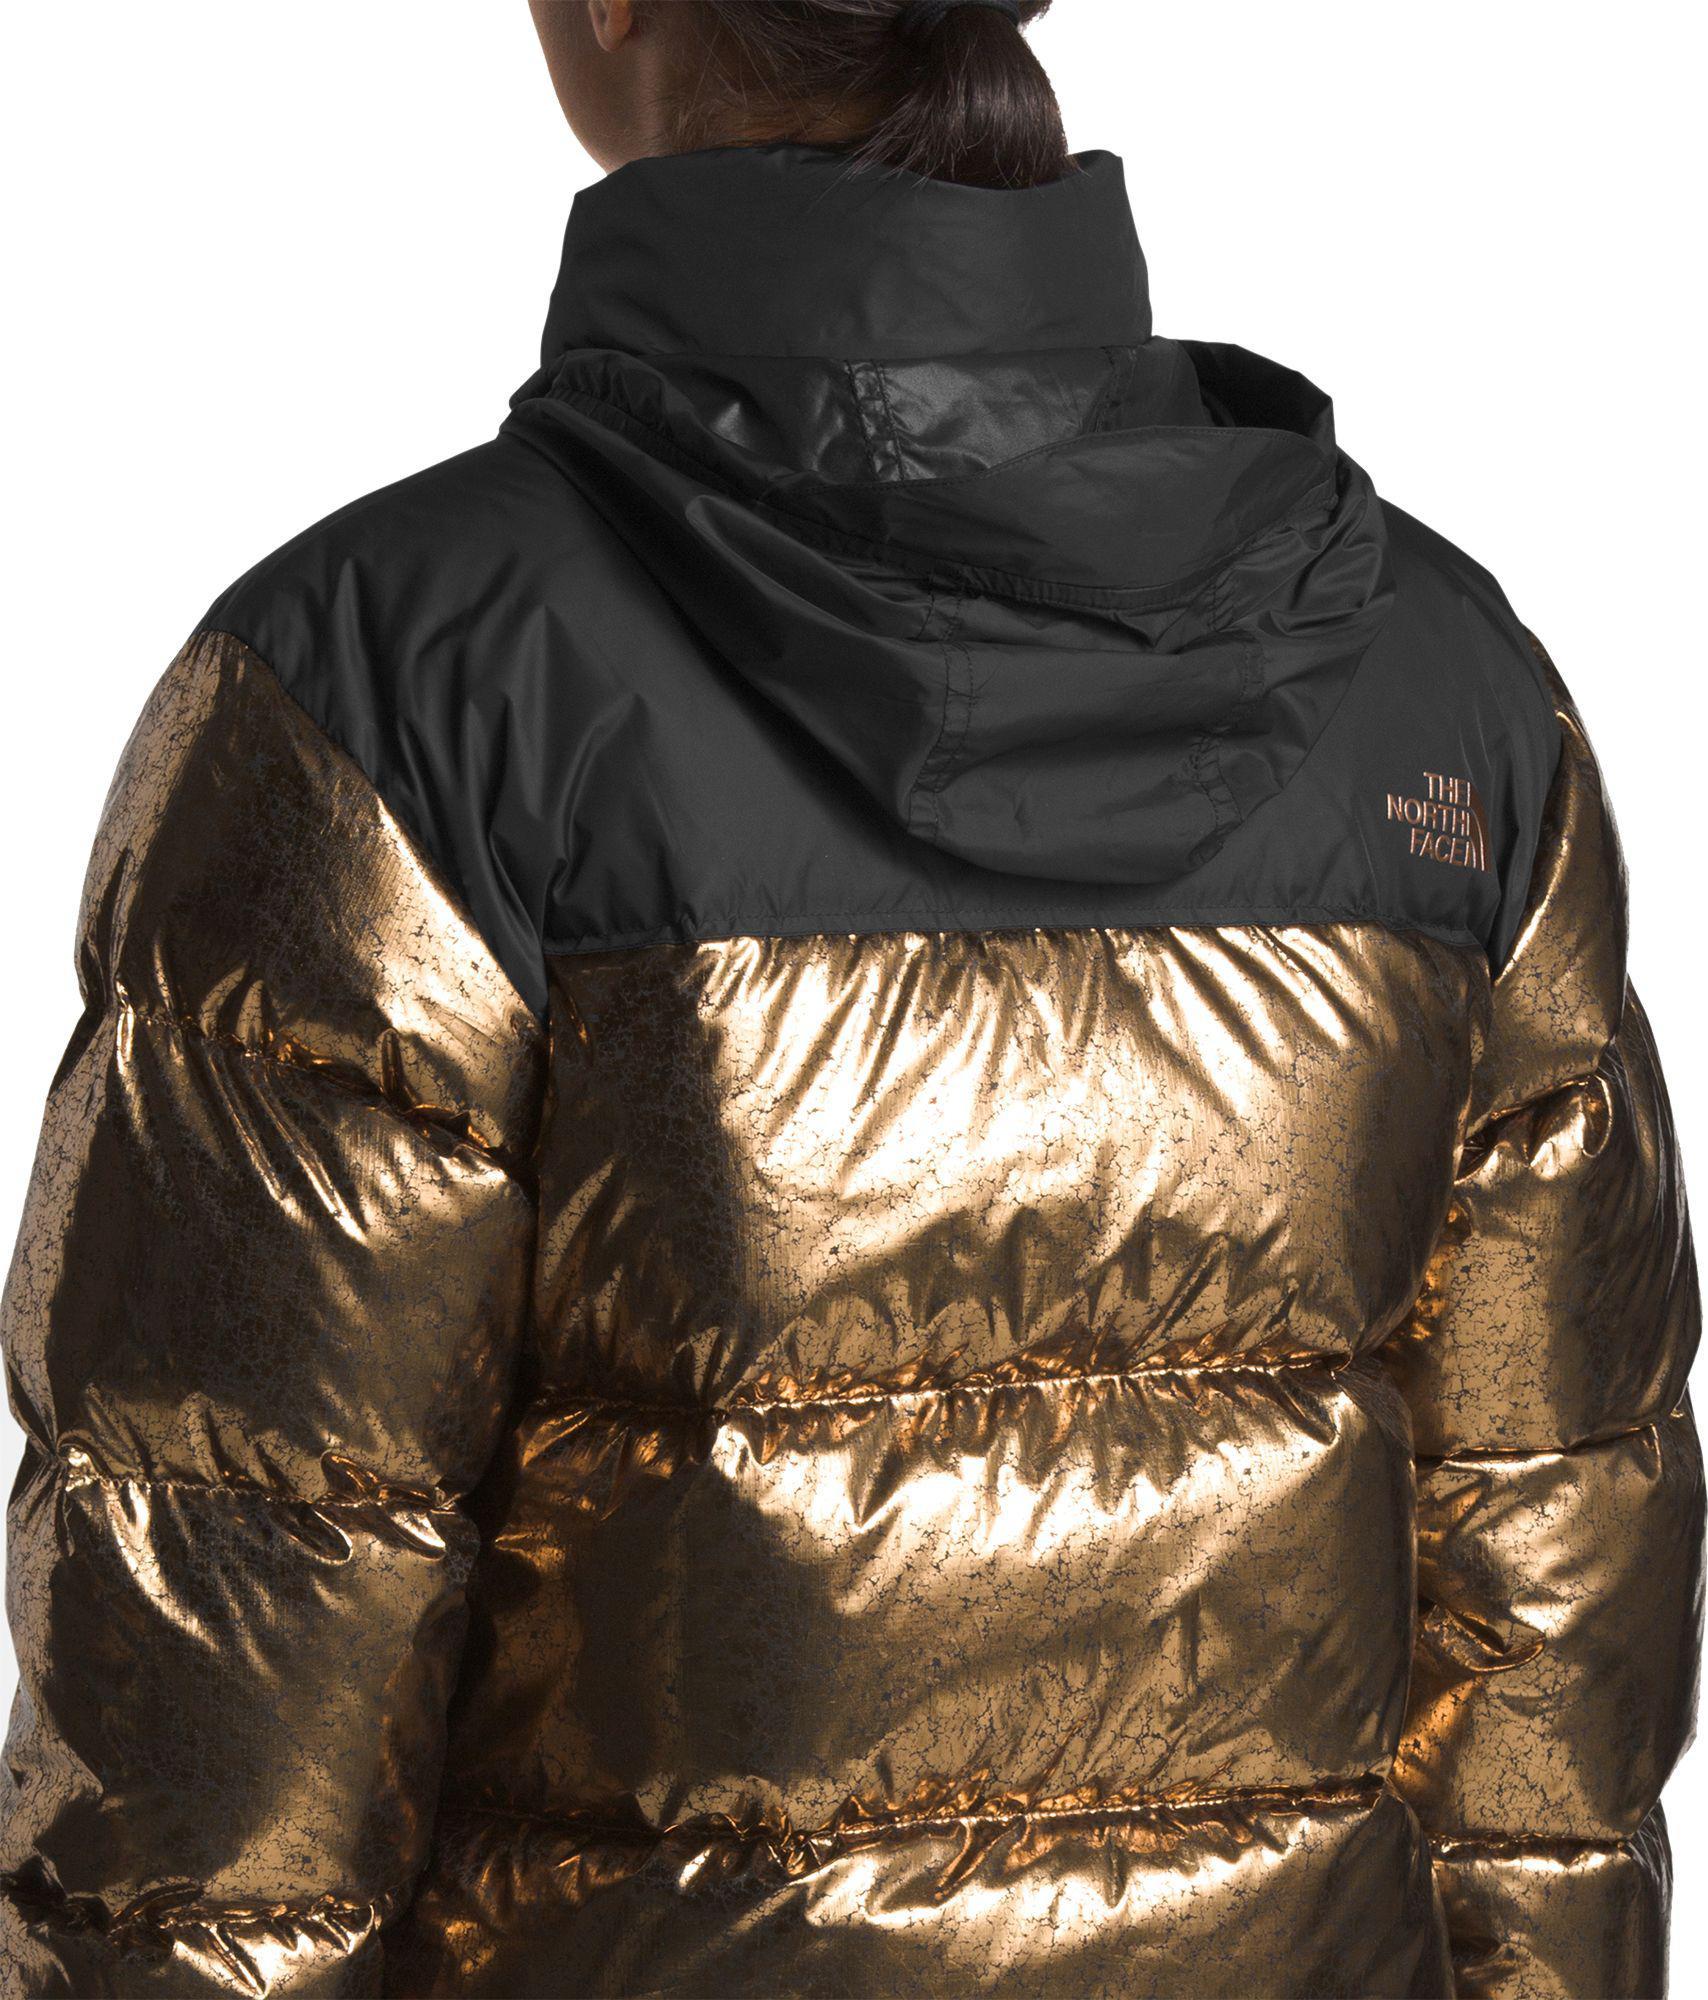 355f6bb3f The North Face Multicolor 1996 Retro Nuptse Jacket